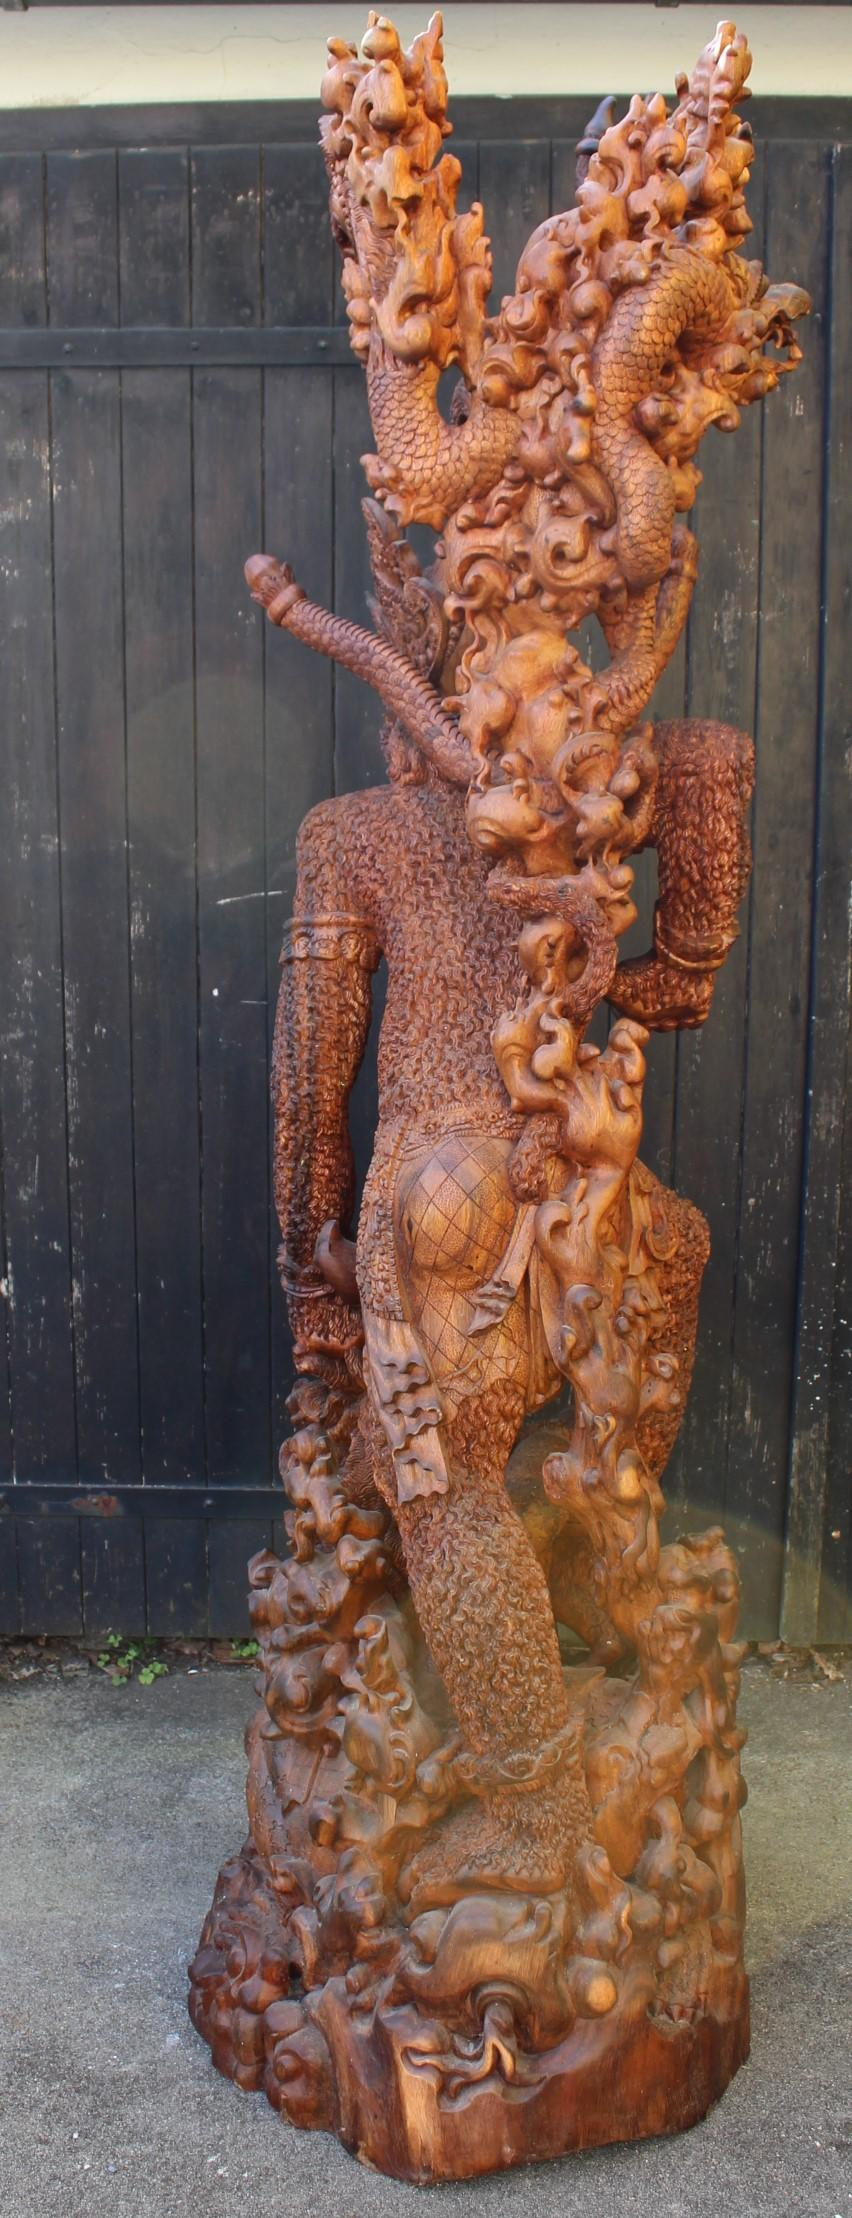 Große Holzskulptur, Indonesien / Bali, 2. Hälfte 20. Jahrhundert-14